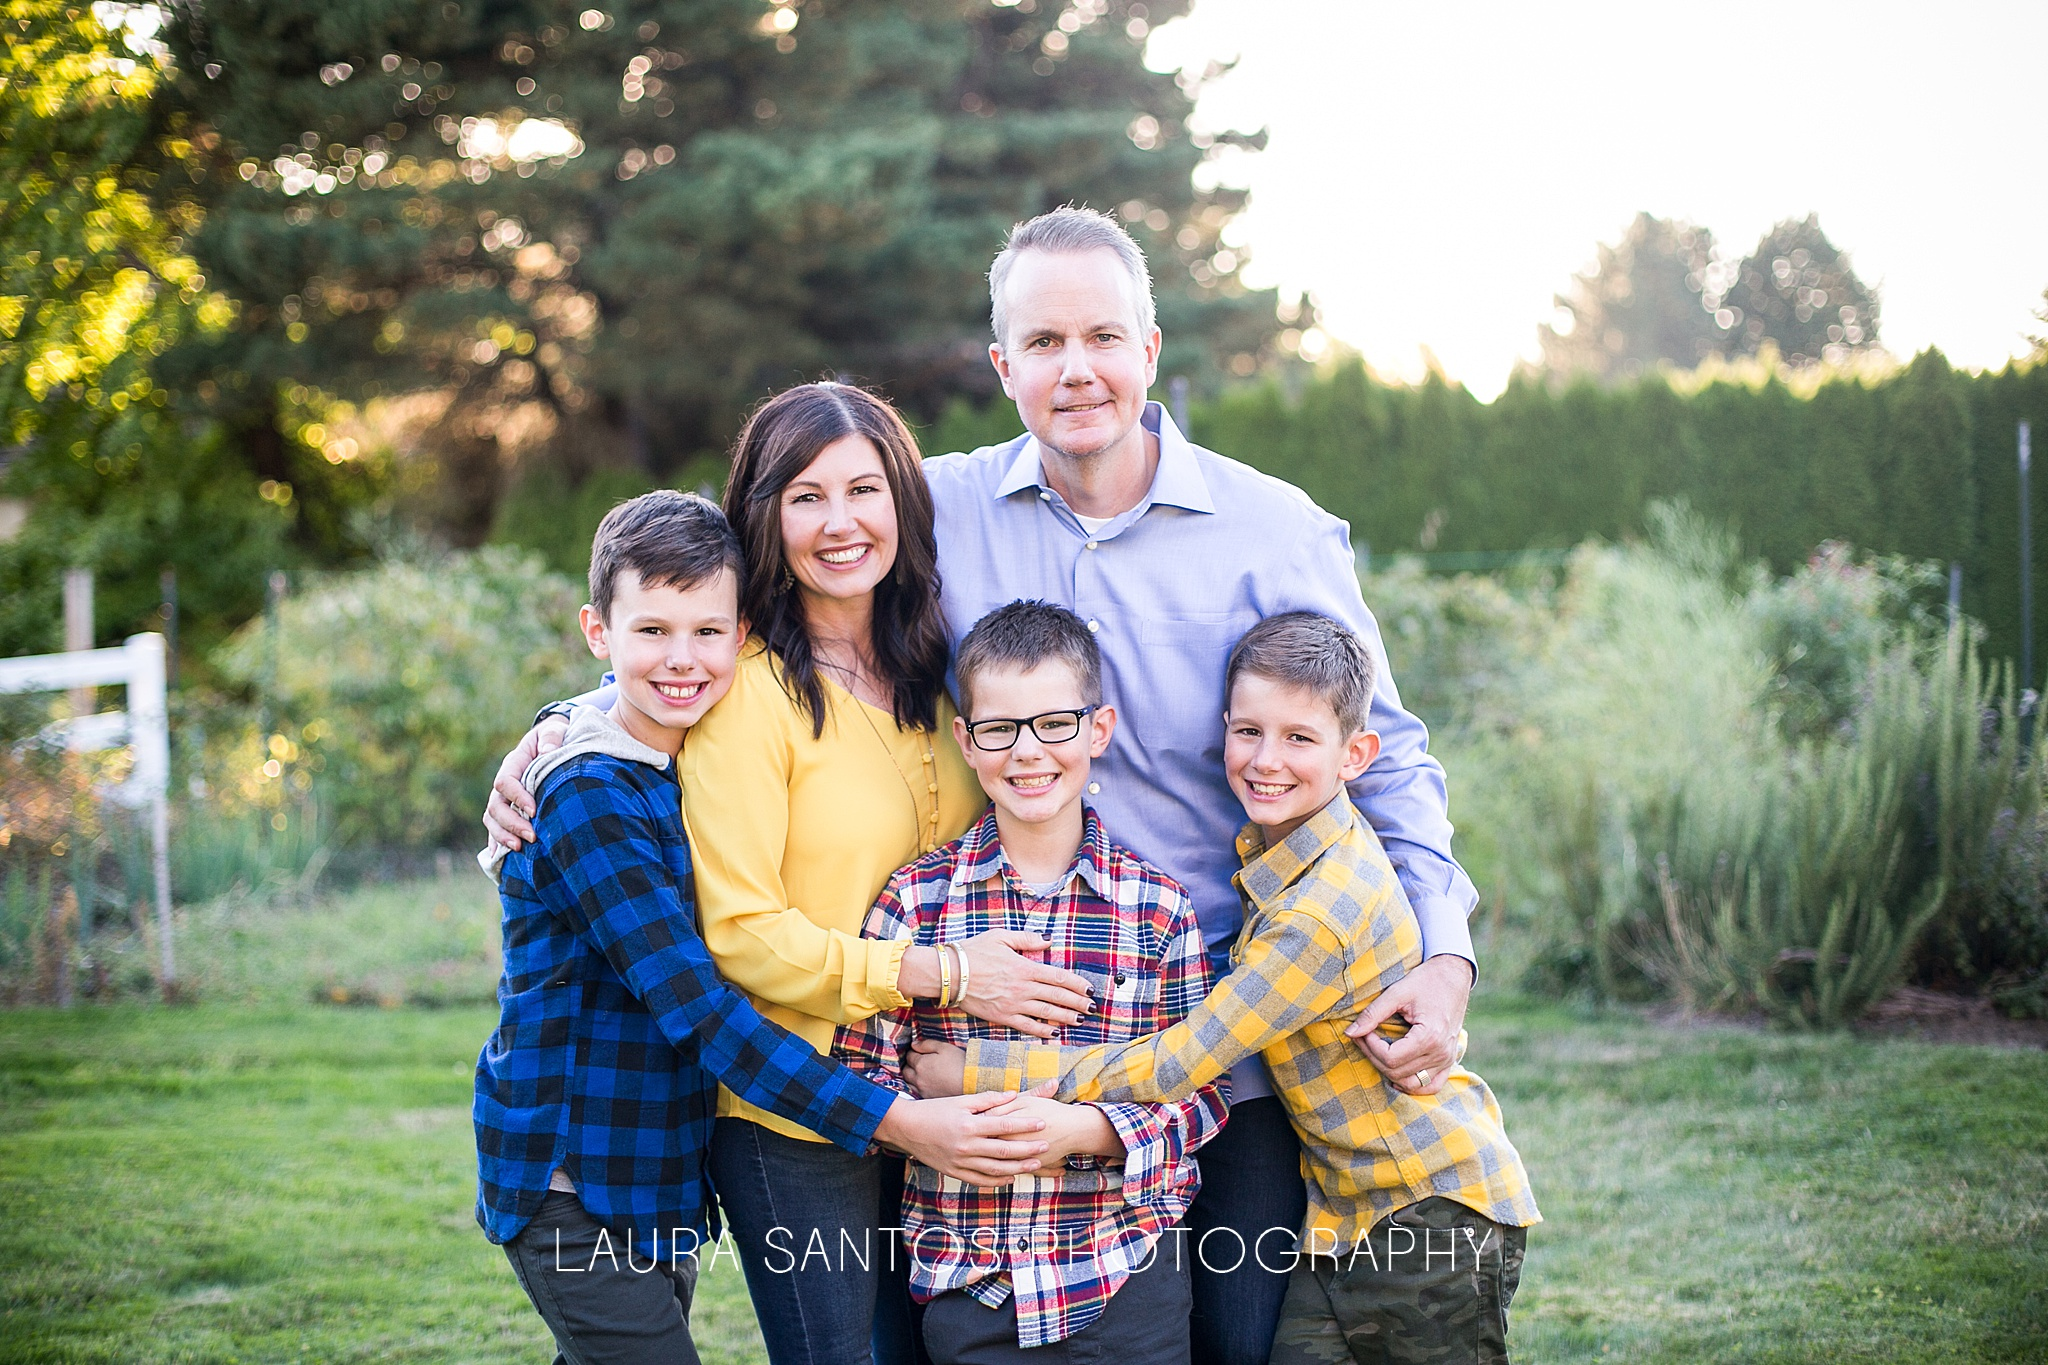 Laura Santos Photography Portland Oregon Family Photographer_0717.jpg